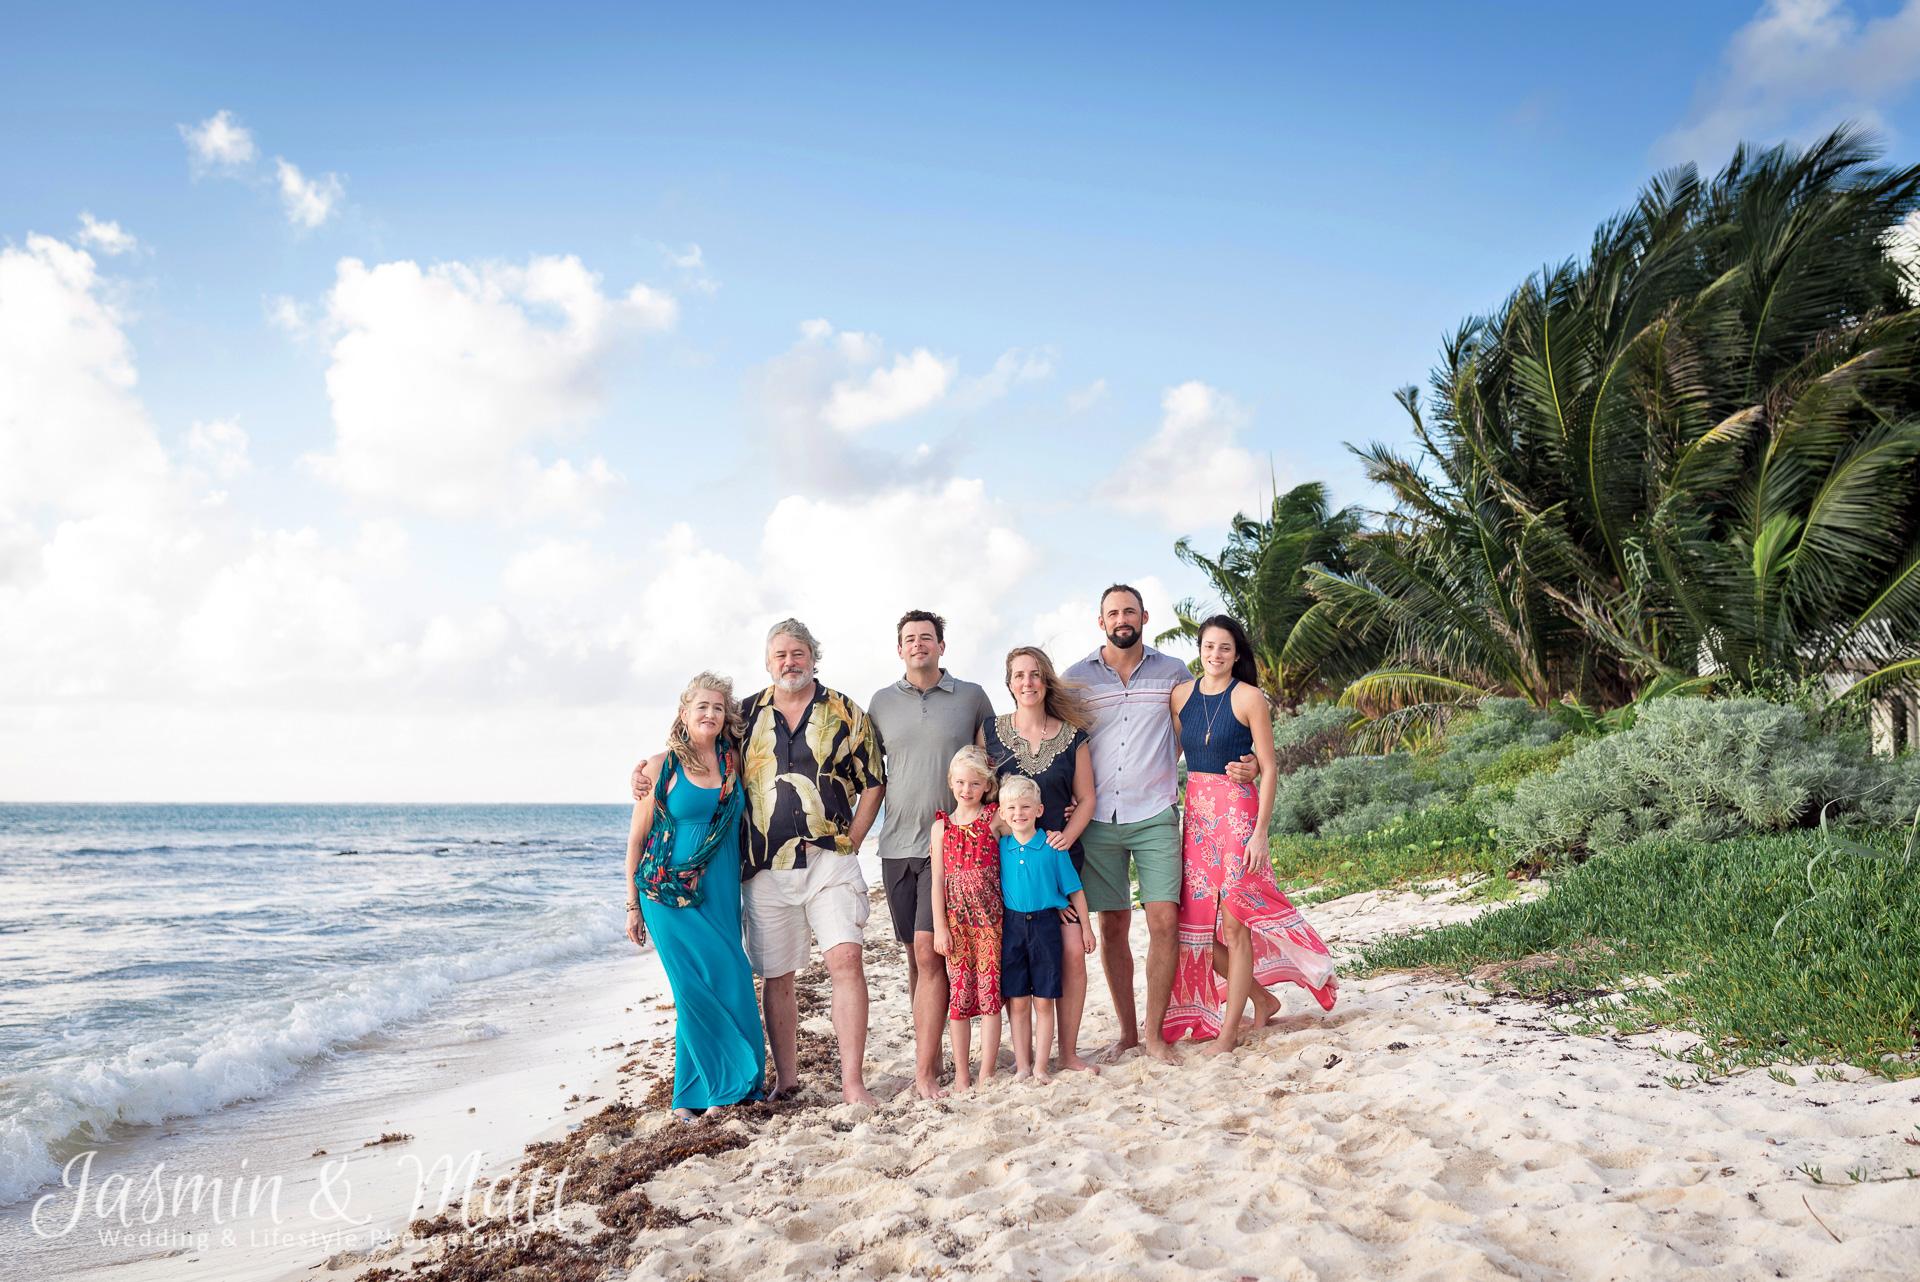 The Allen Family Photo session on Tankah Beach at Solimon Bay, Mexico